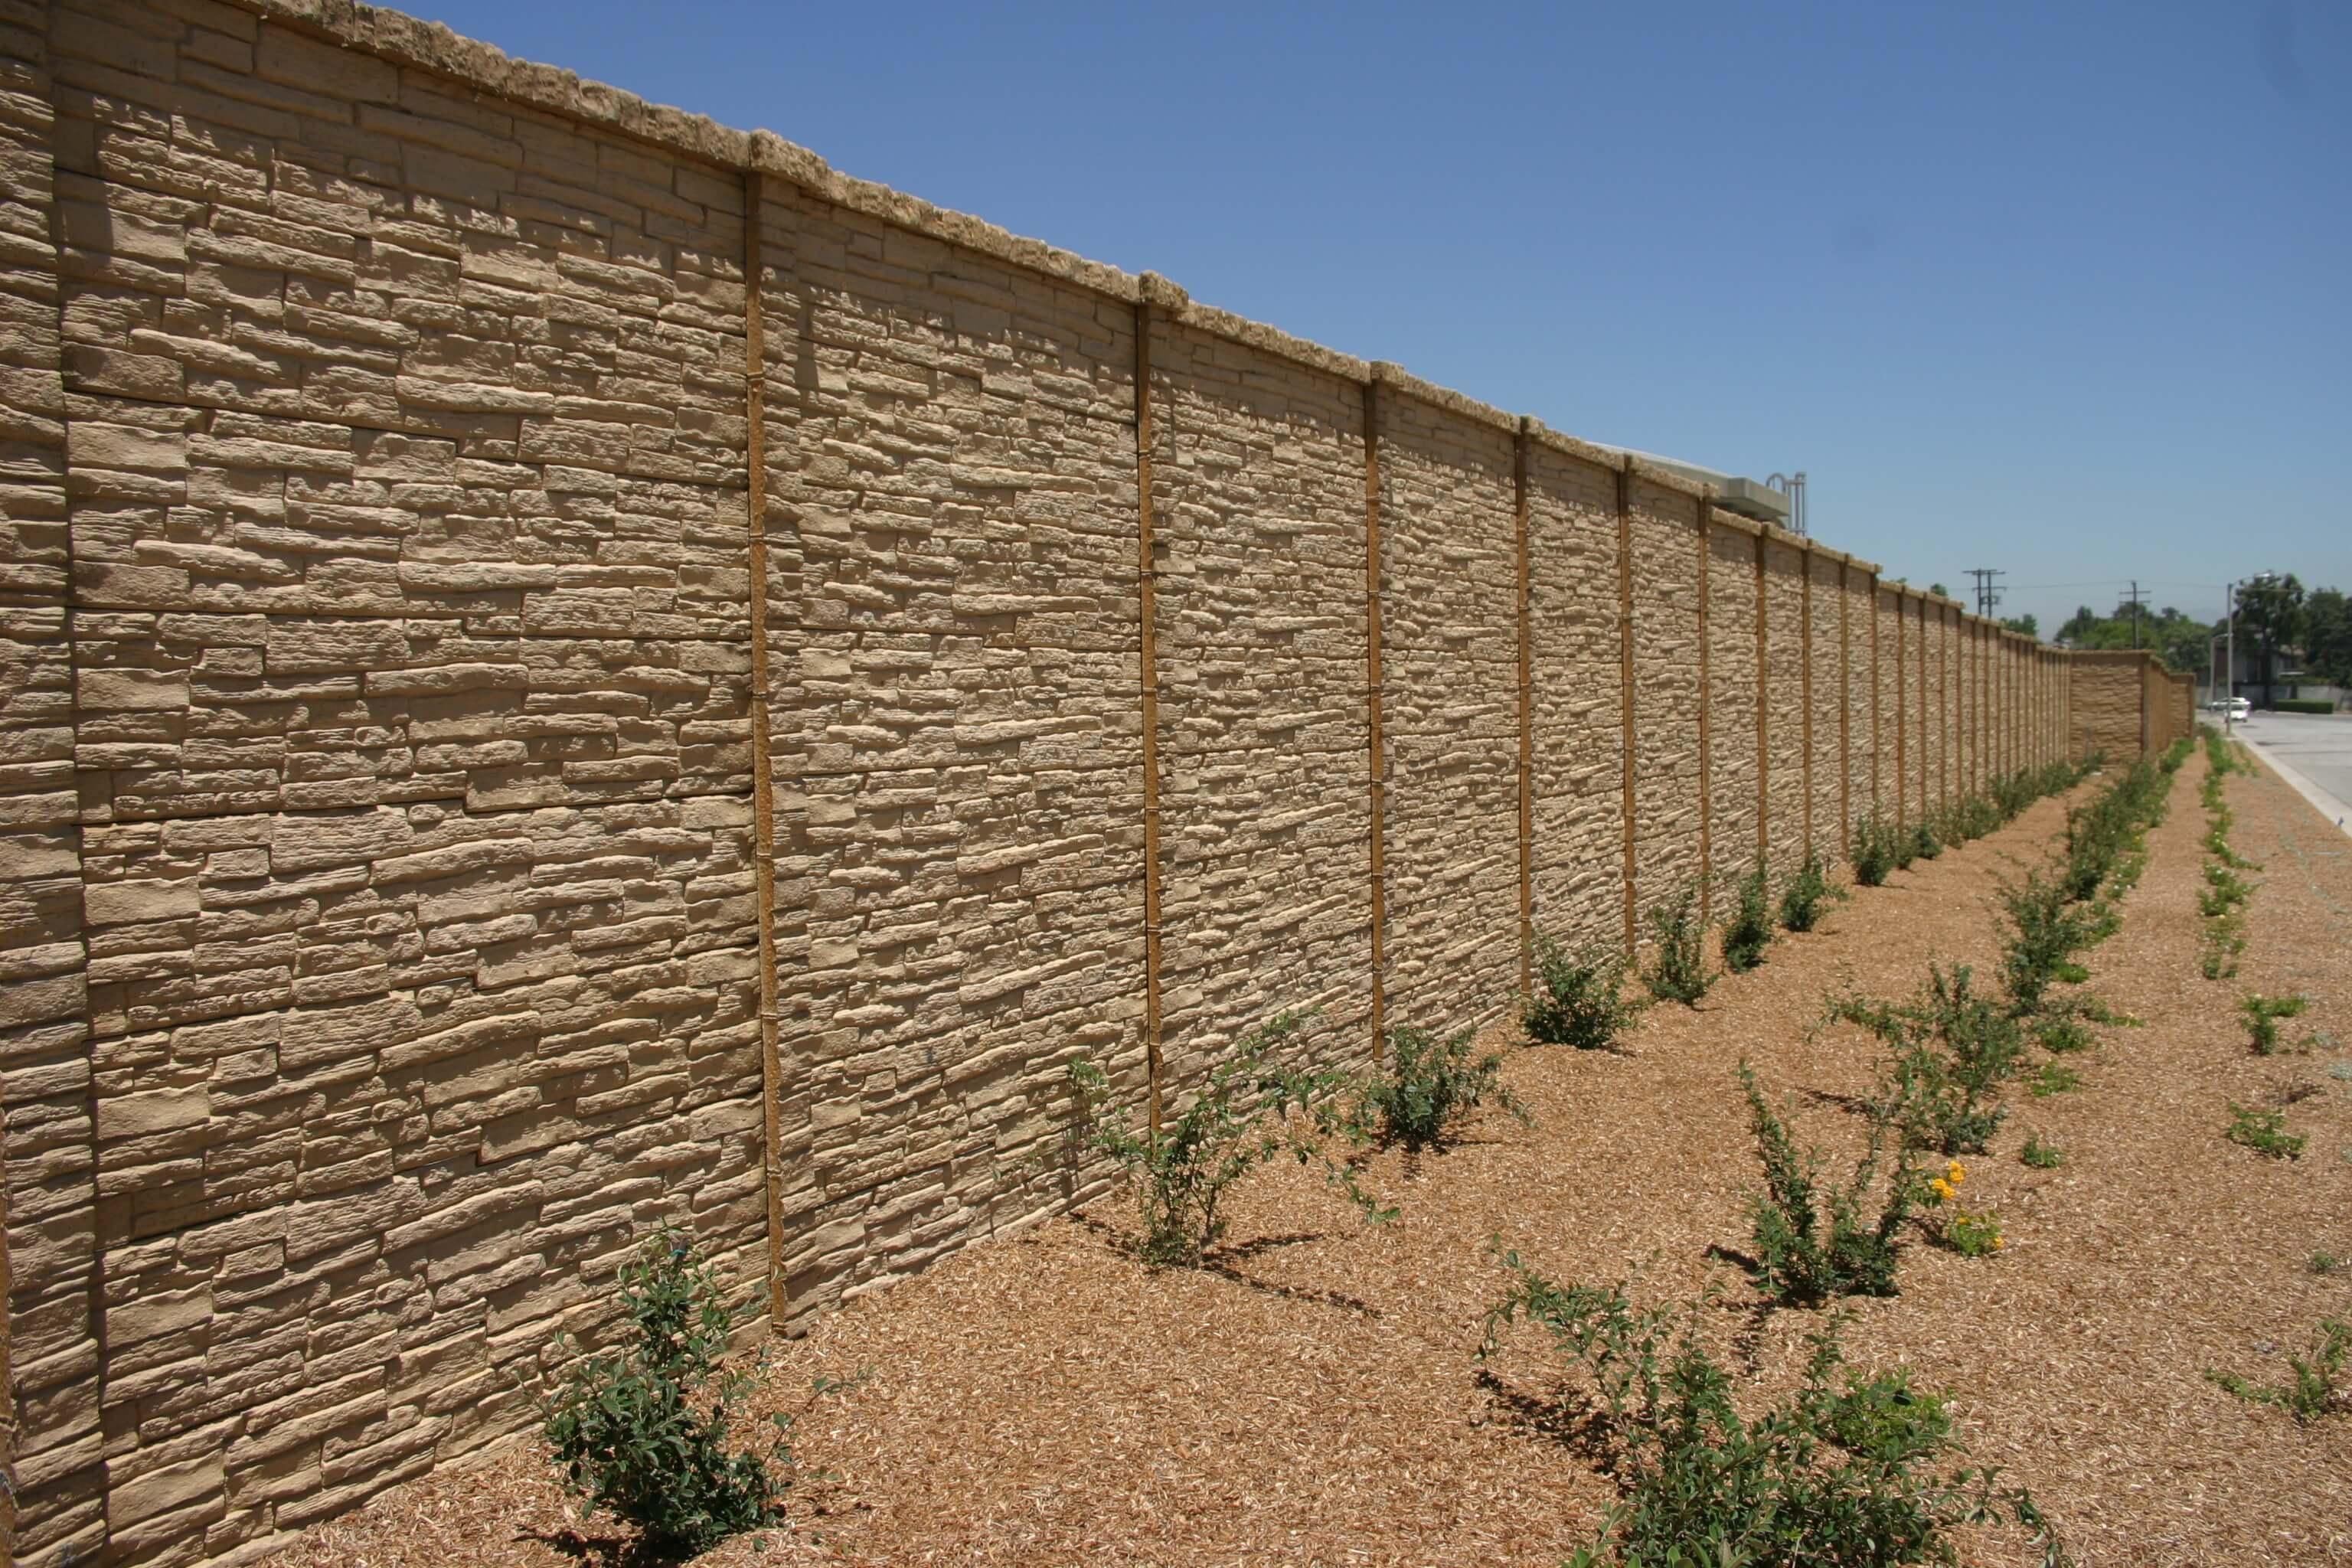 Preacst Concrete Fence StackedStone